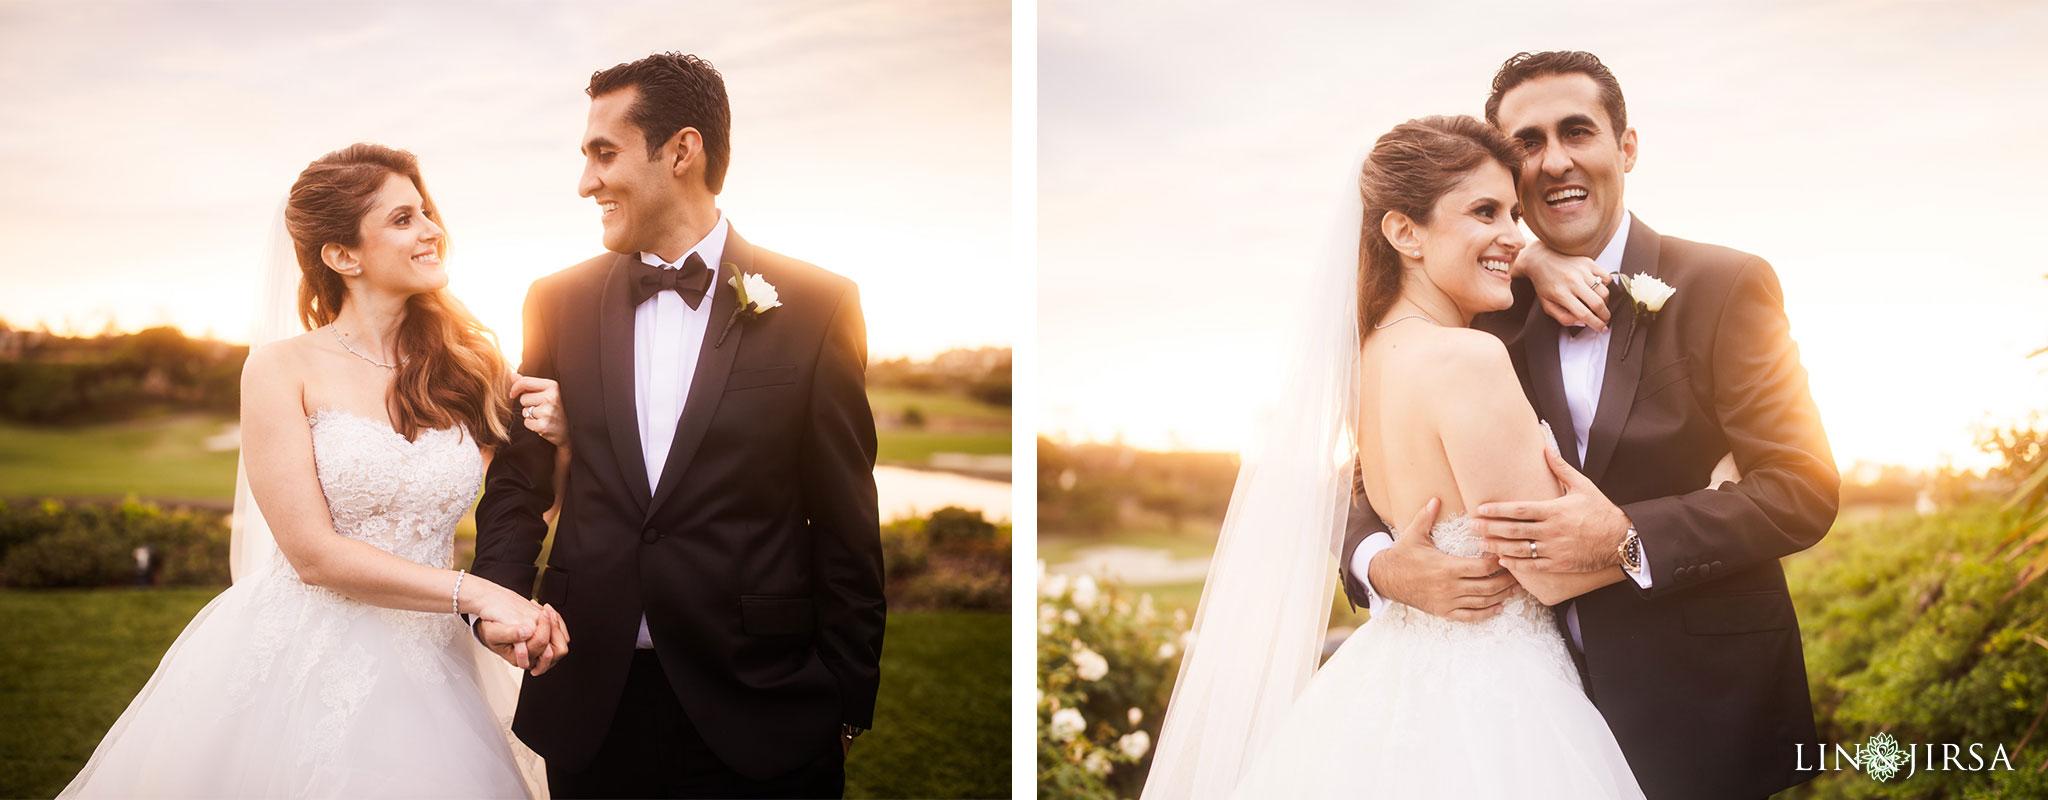 25 monarch beach resort laguna niguel persian wedding photography